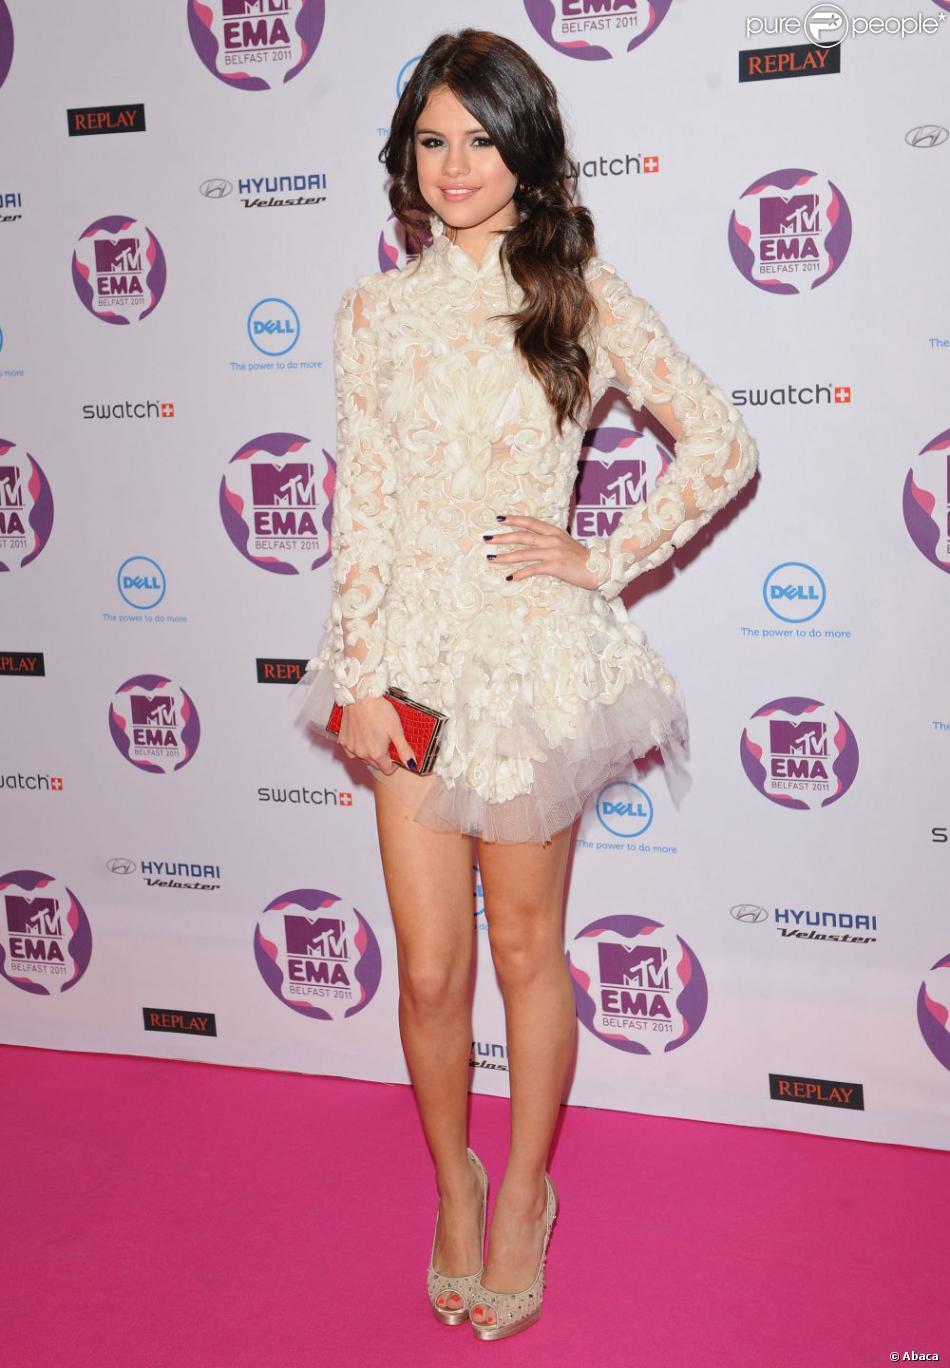 La Star De La Soiree Selena Gomez A Assume Son Rang Lors De Son